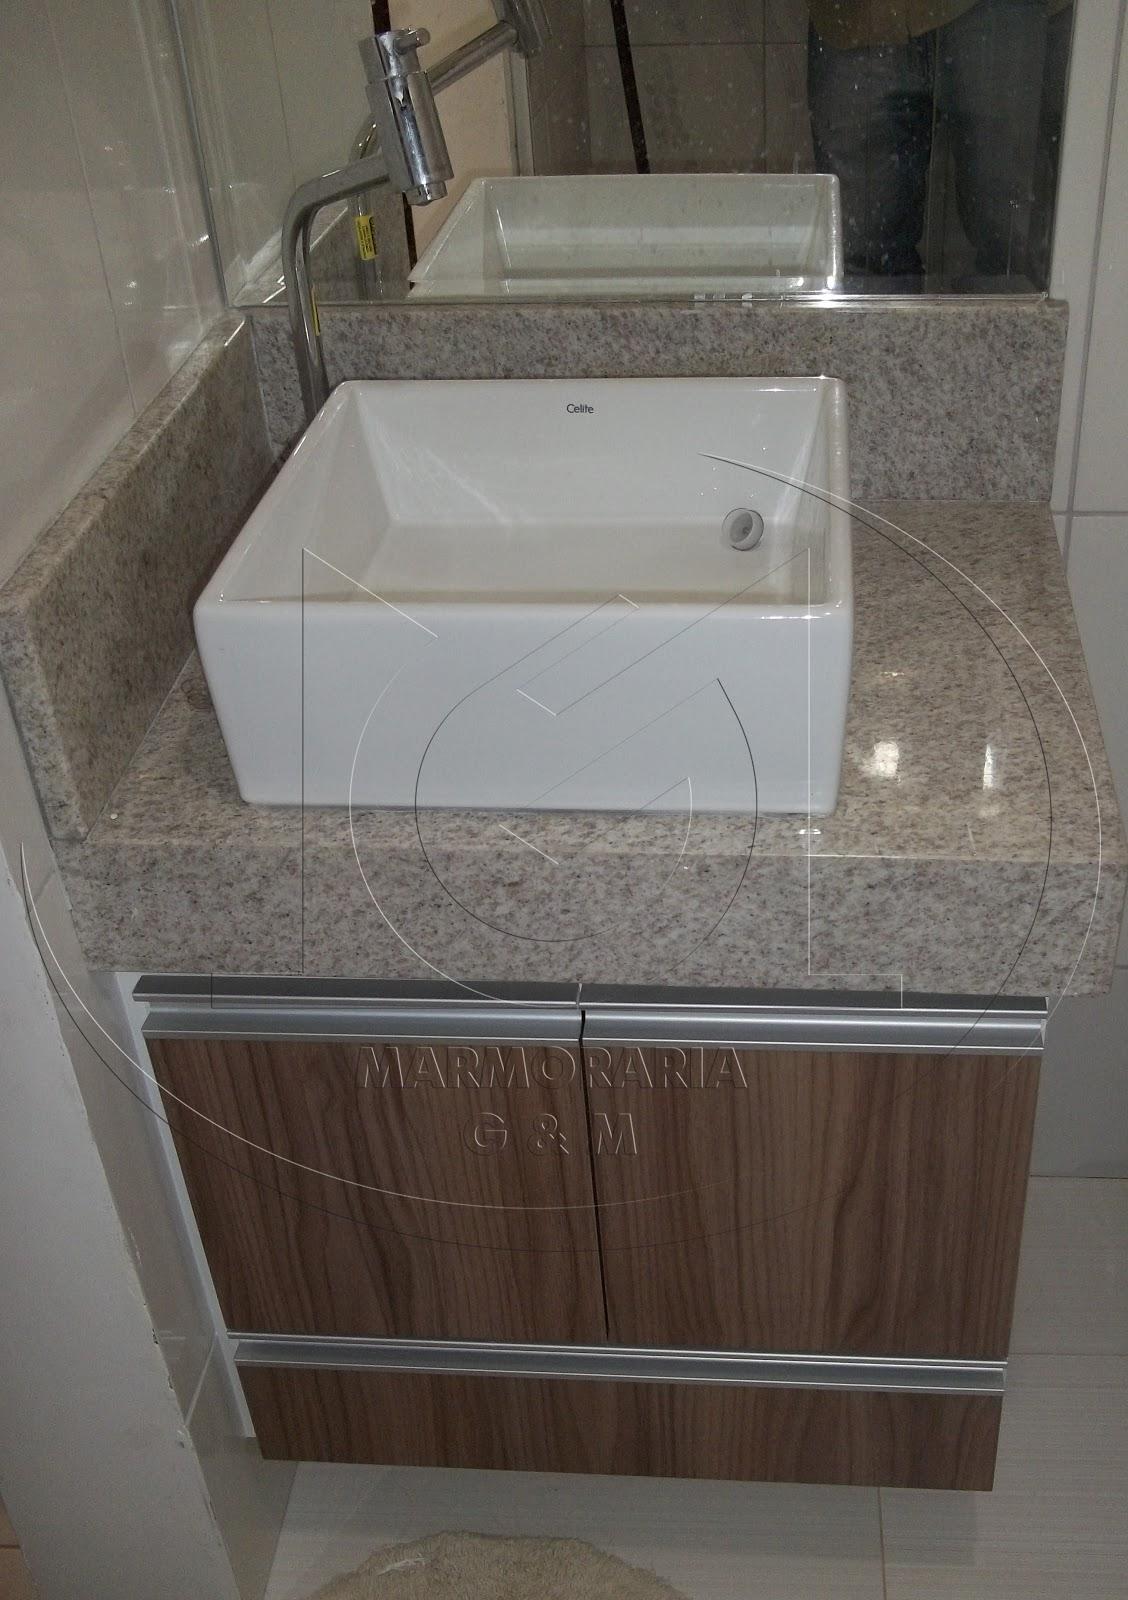 Lavatório em Granito Branco Siena Marmoraria Goiás e Minas #3F352E 1128x1600 Banheiro Branco Siena